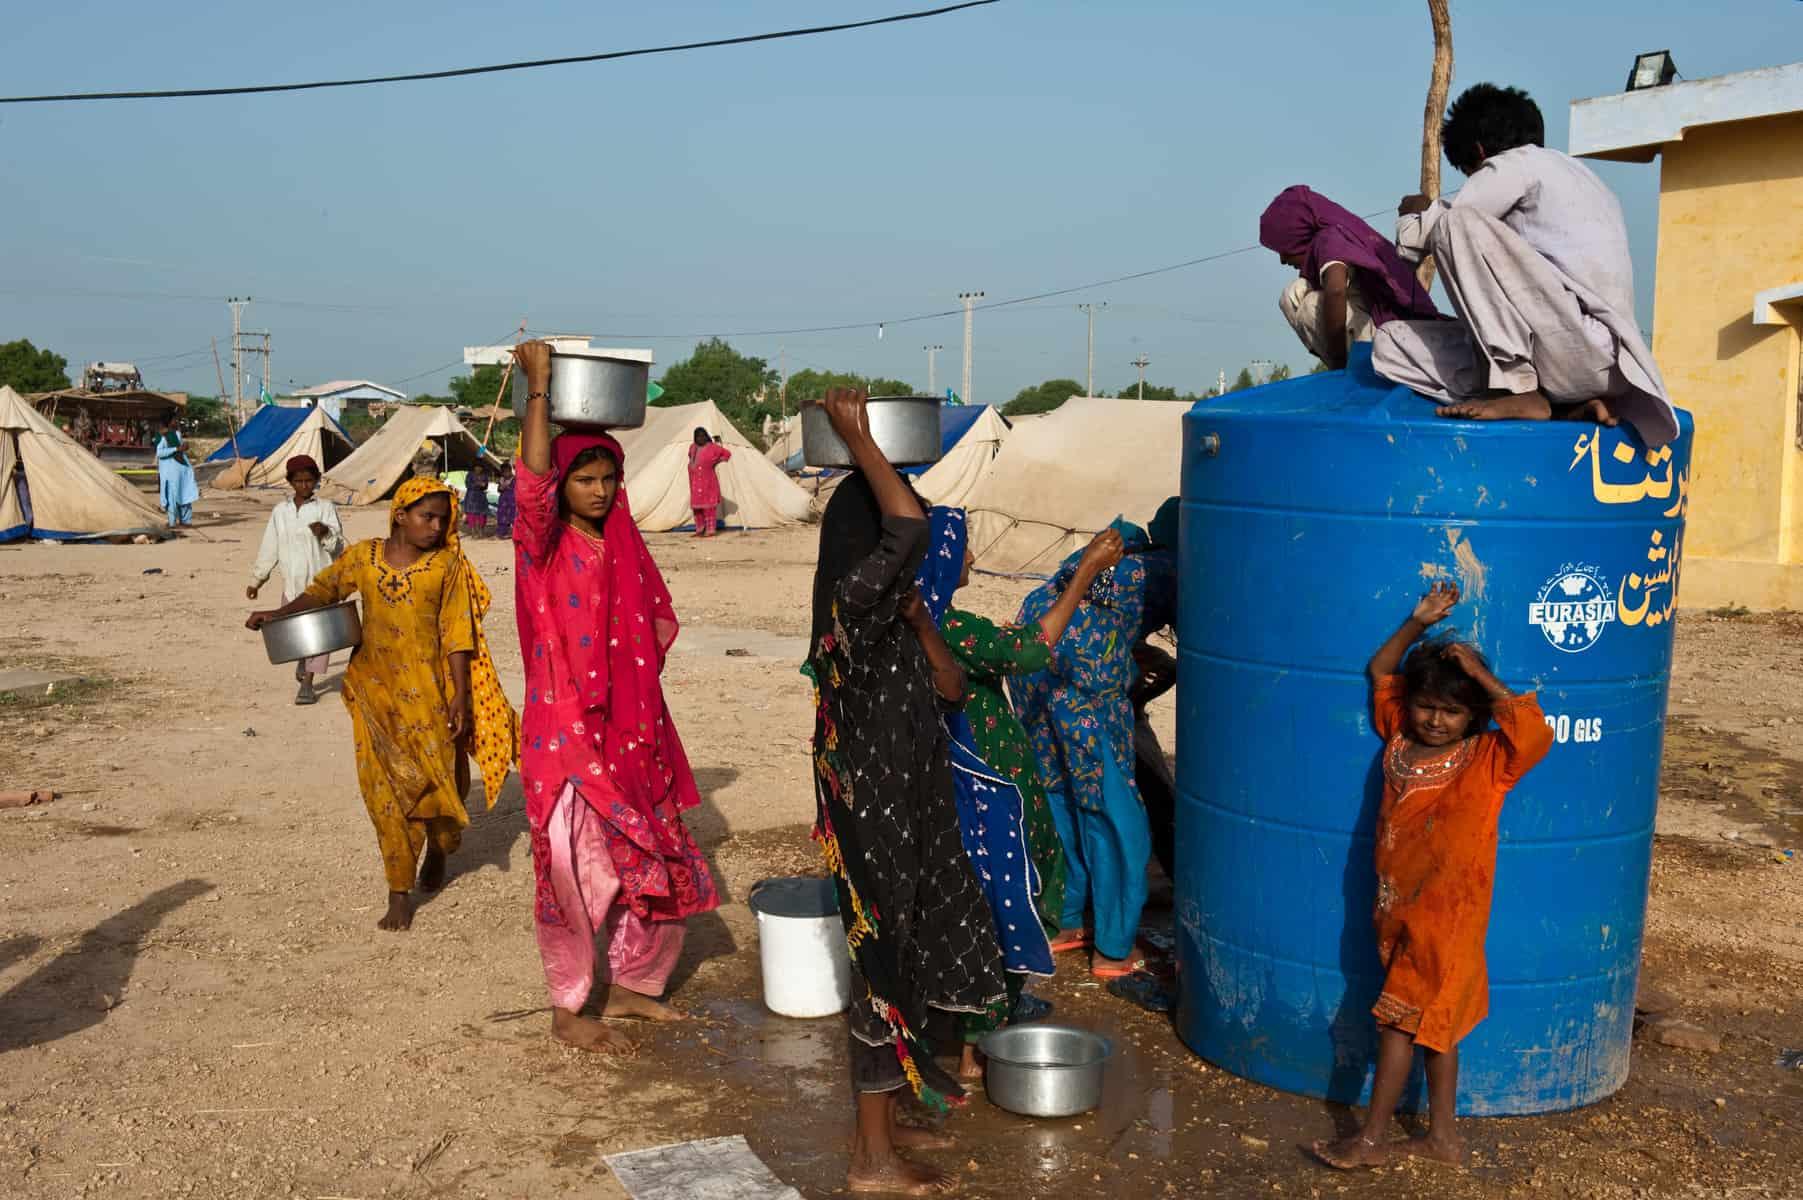 © Asian Development Bank via Flickr